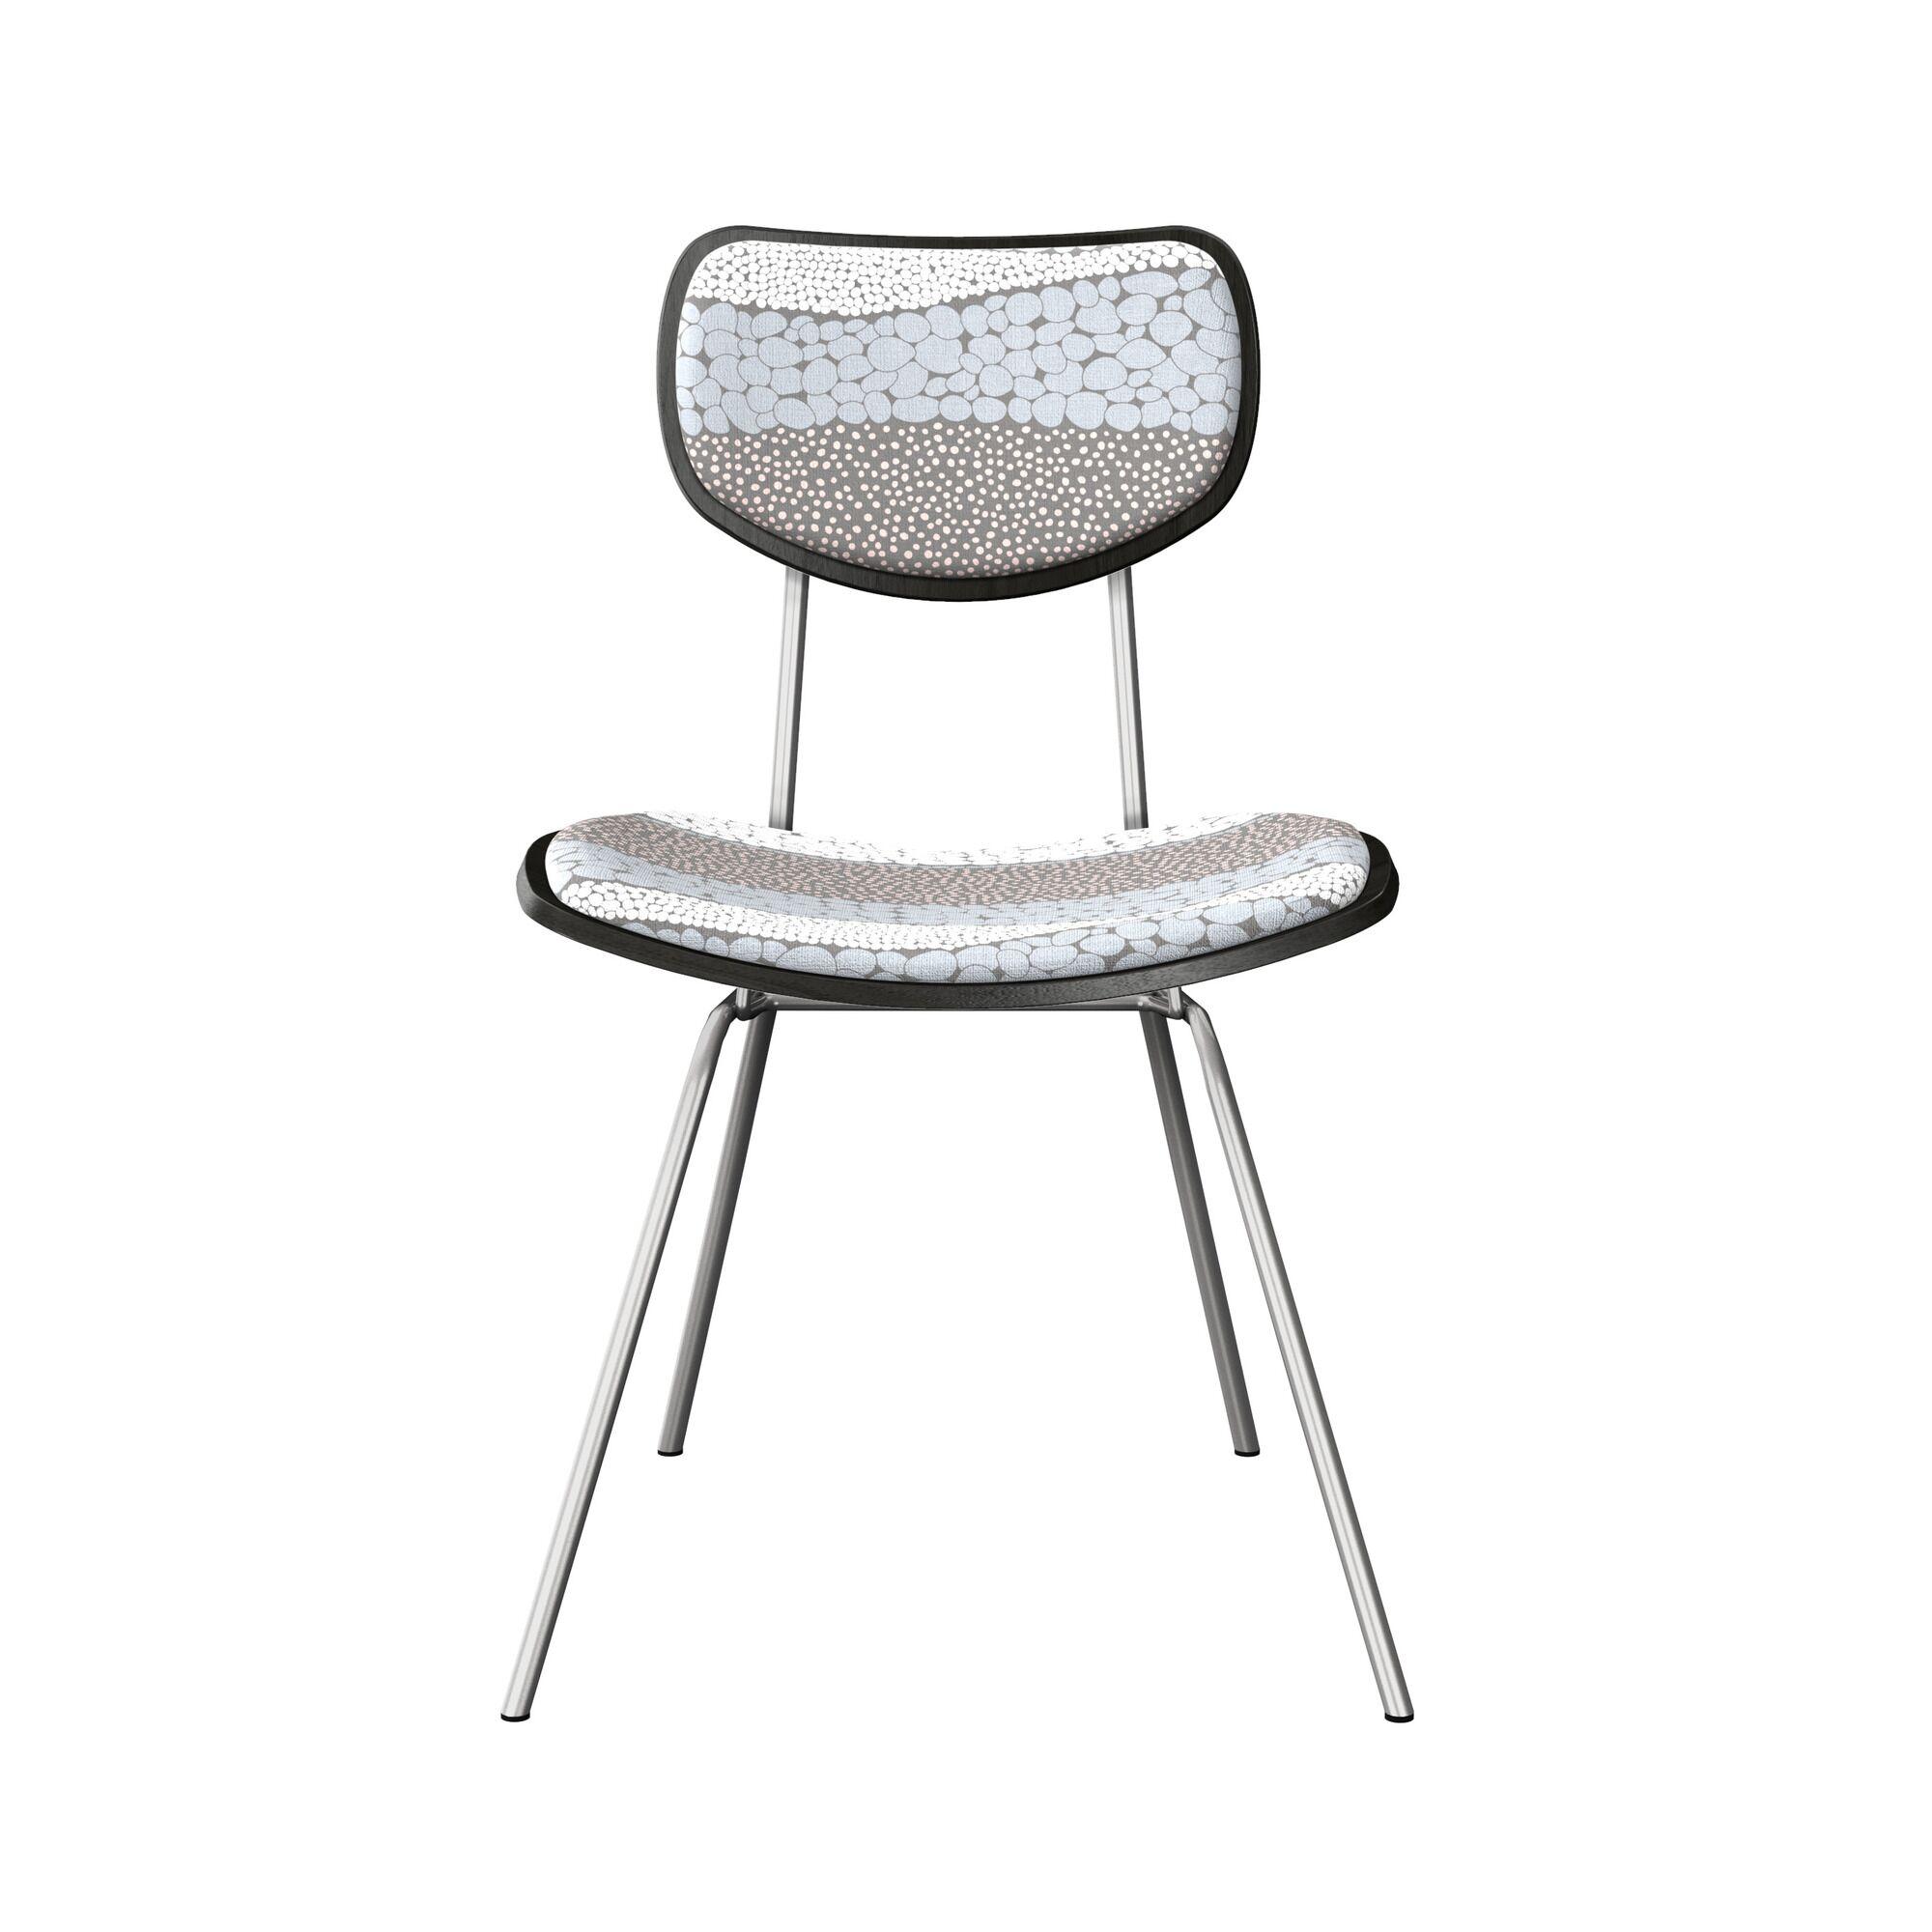 Coggrey Upholstered Dining Chair Frame Color: Black, Leg Color: Chrome